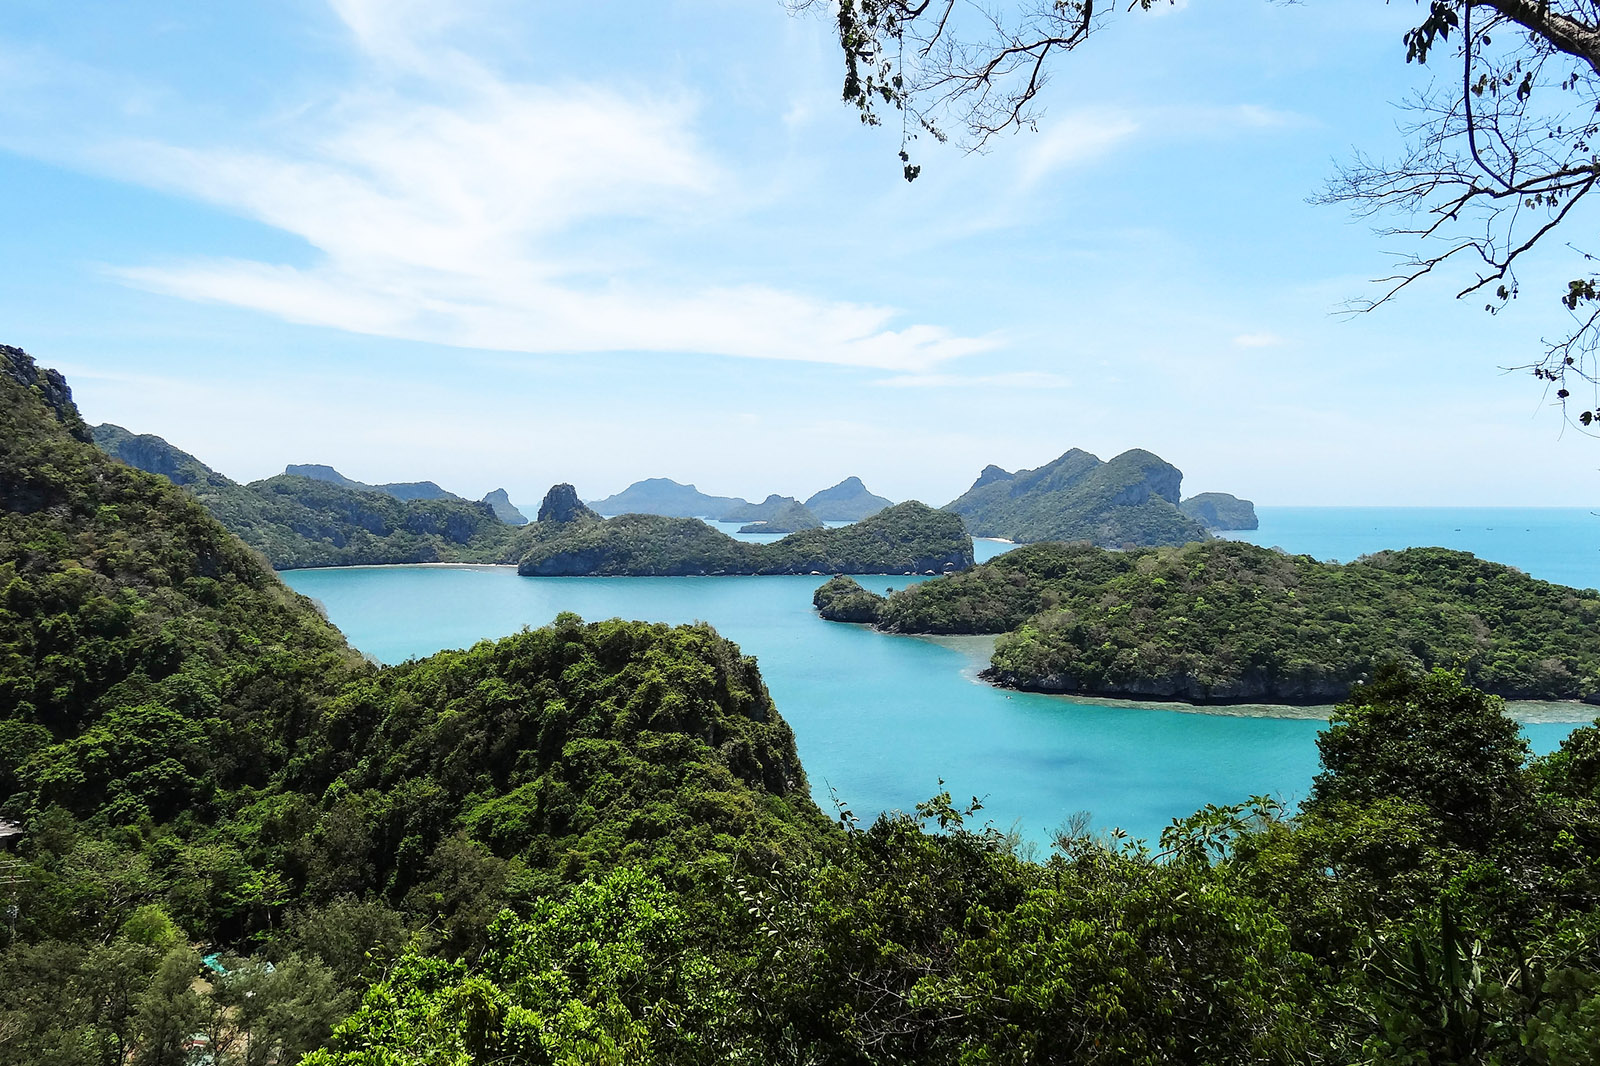 Ang Thong National Marine Park: Paradise near Koh Samui